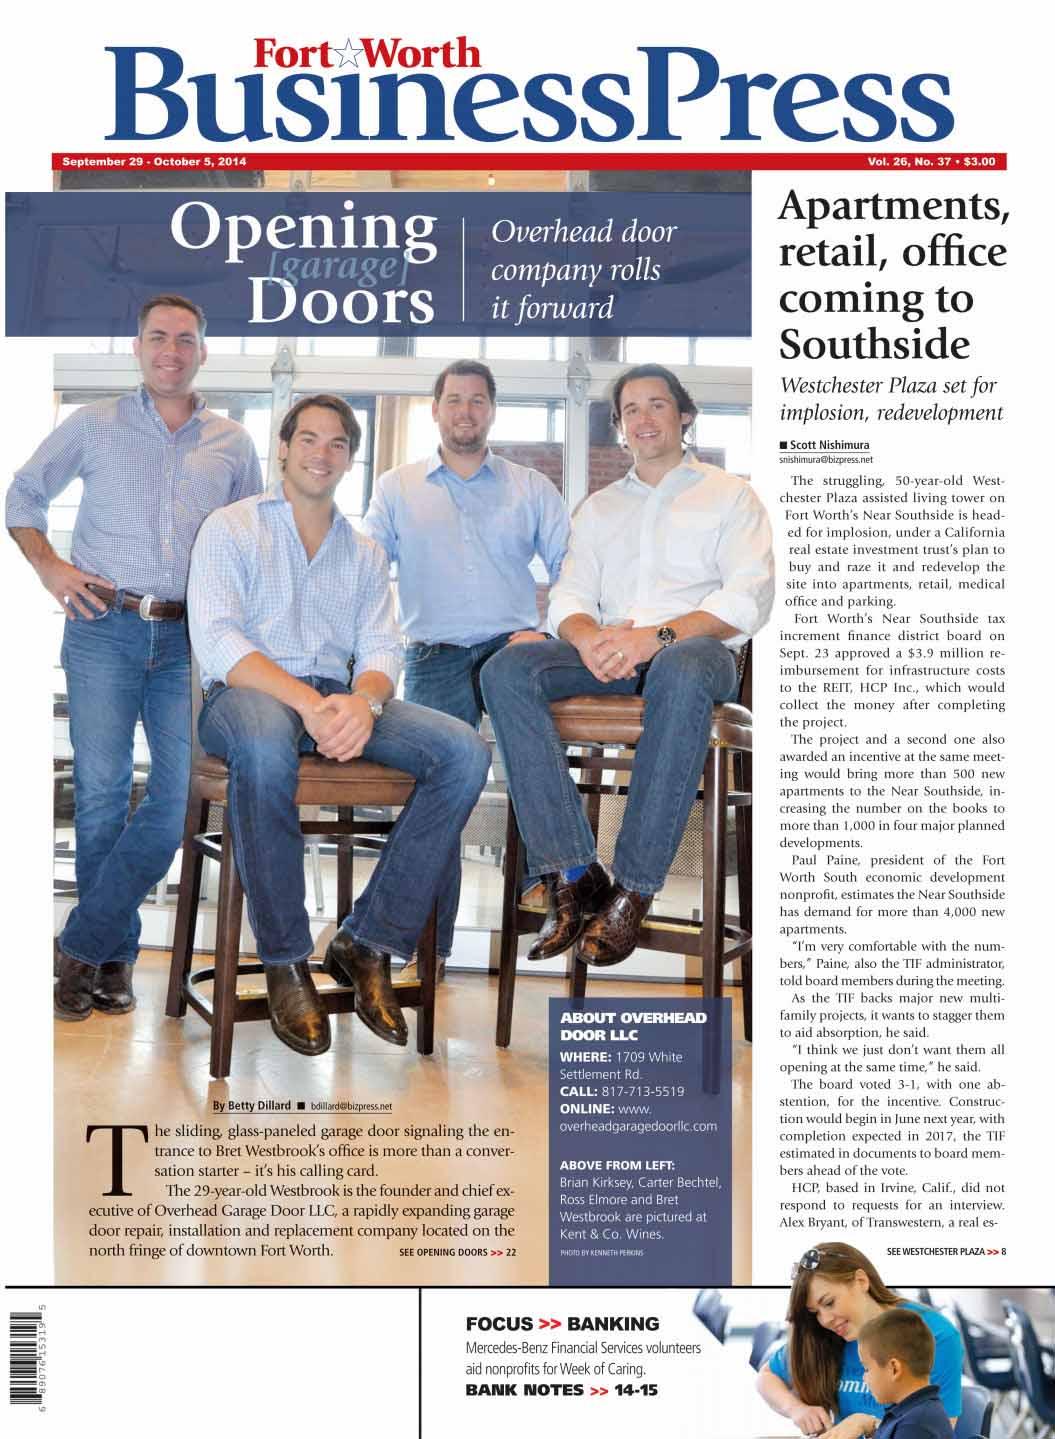 Etonnant Dallas Garage Door Repair In The Press